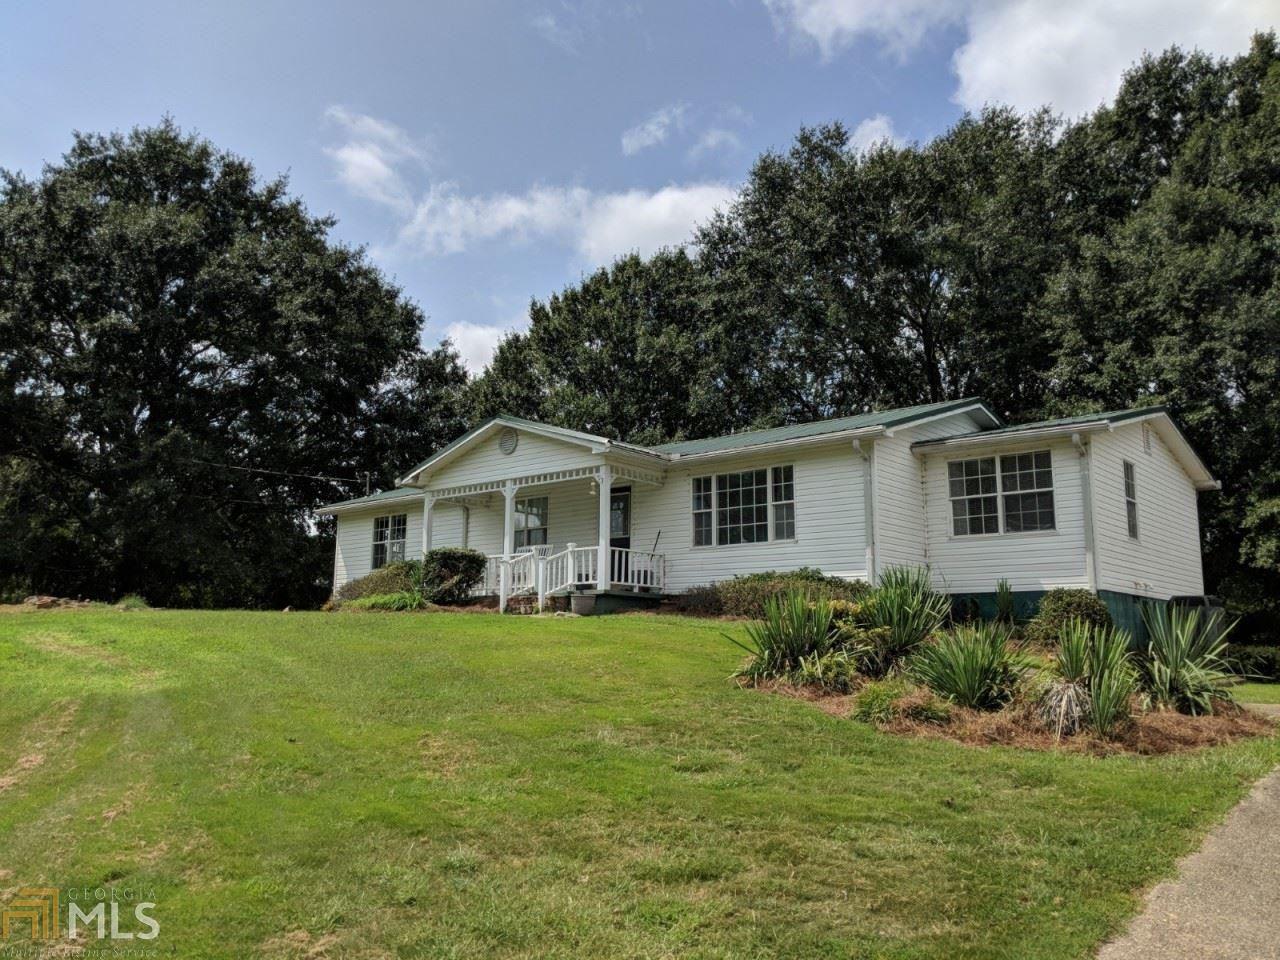 3447 Lakeland Rd, Gainesville, GA 30506 - MLS#: 8867101